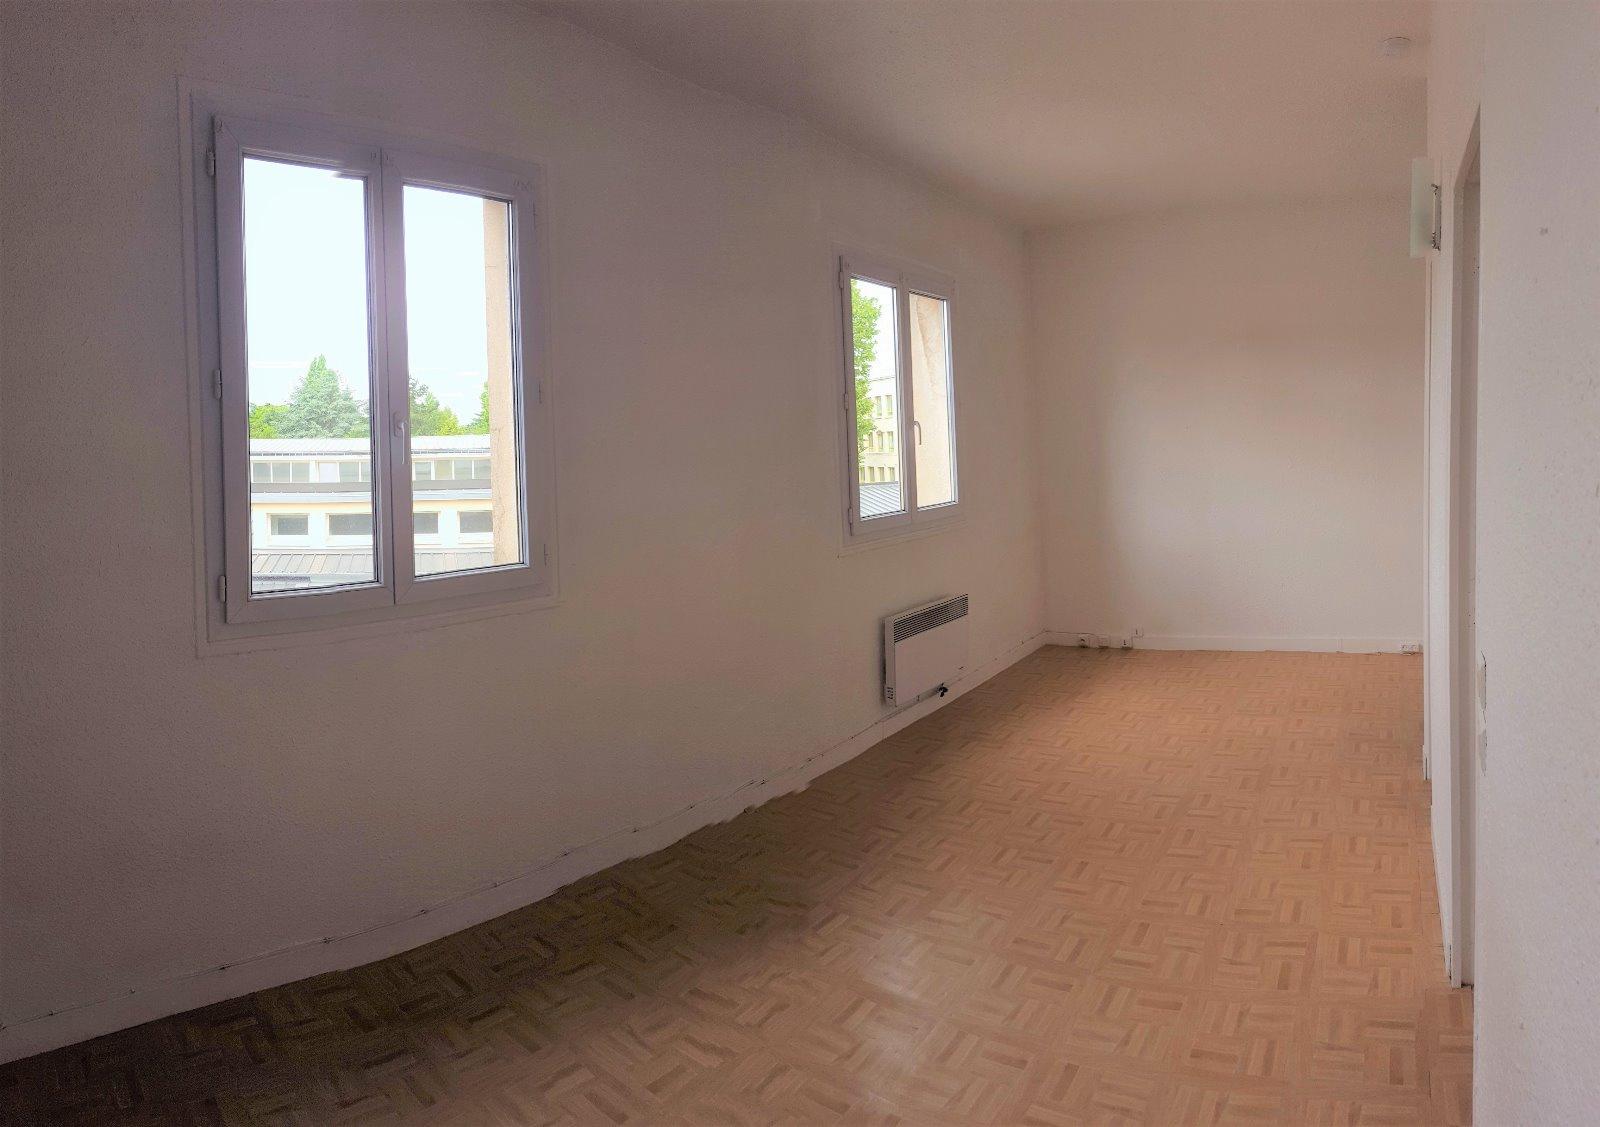 Offres de location Studio Montmorency 95160